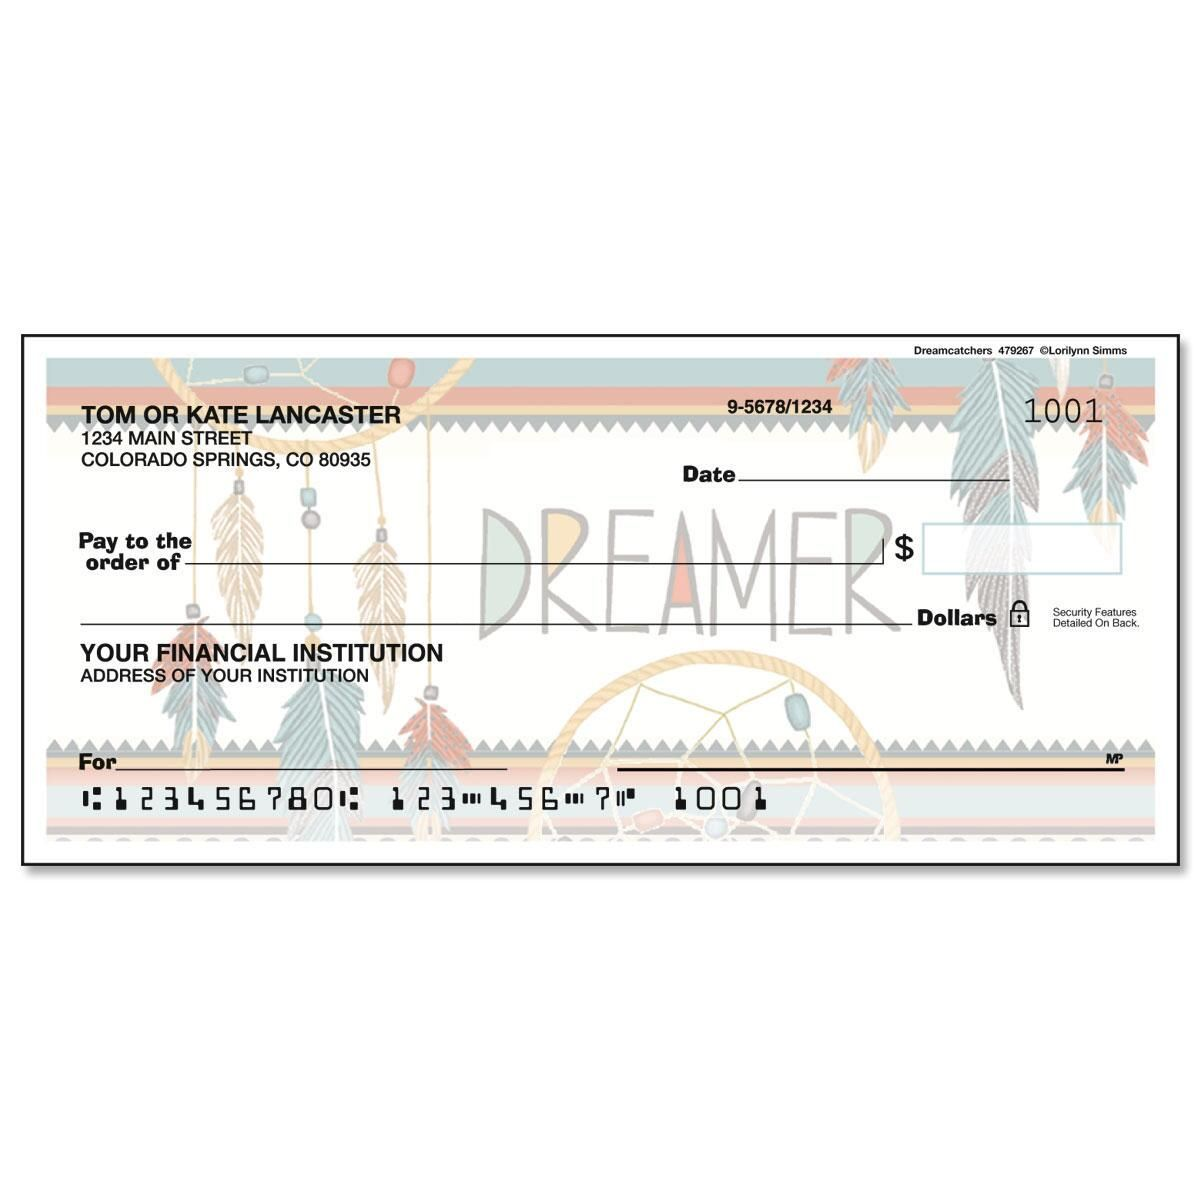 Dreamcatchers Duplicate Checks